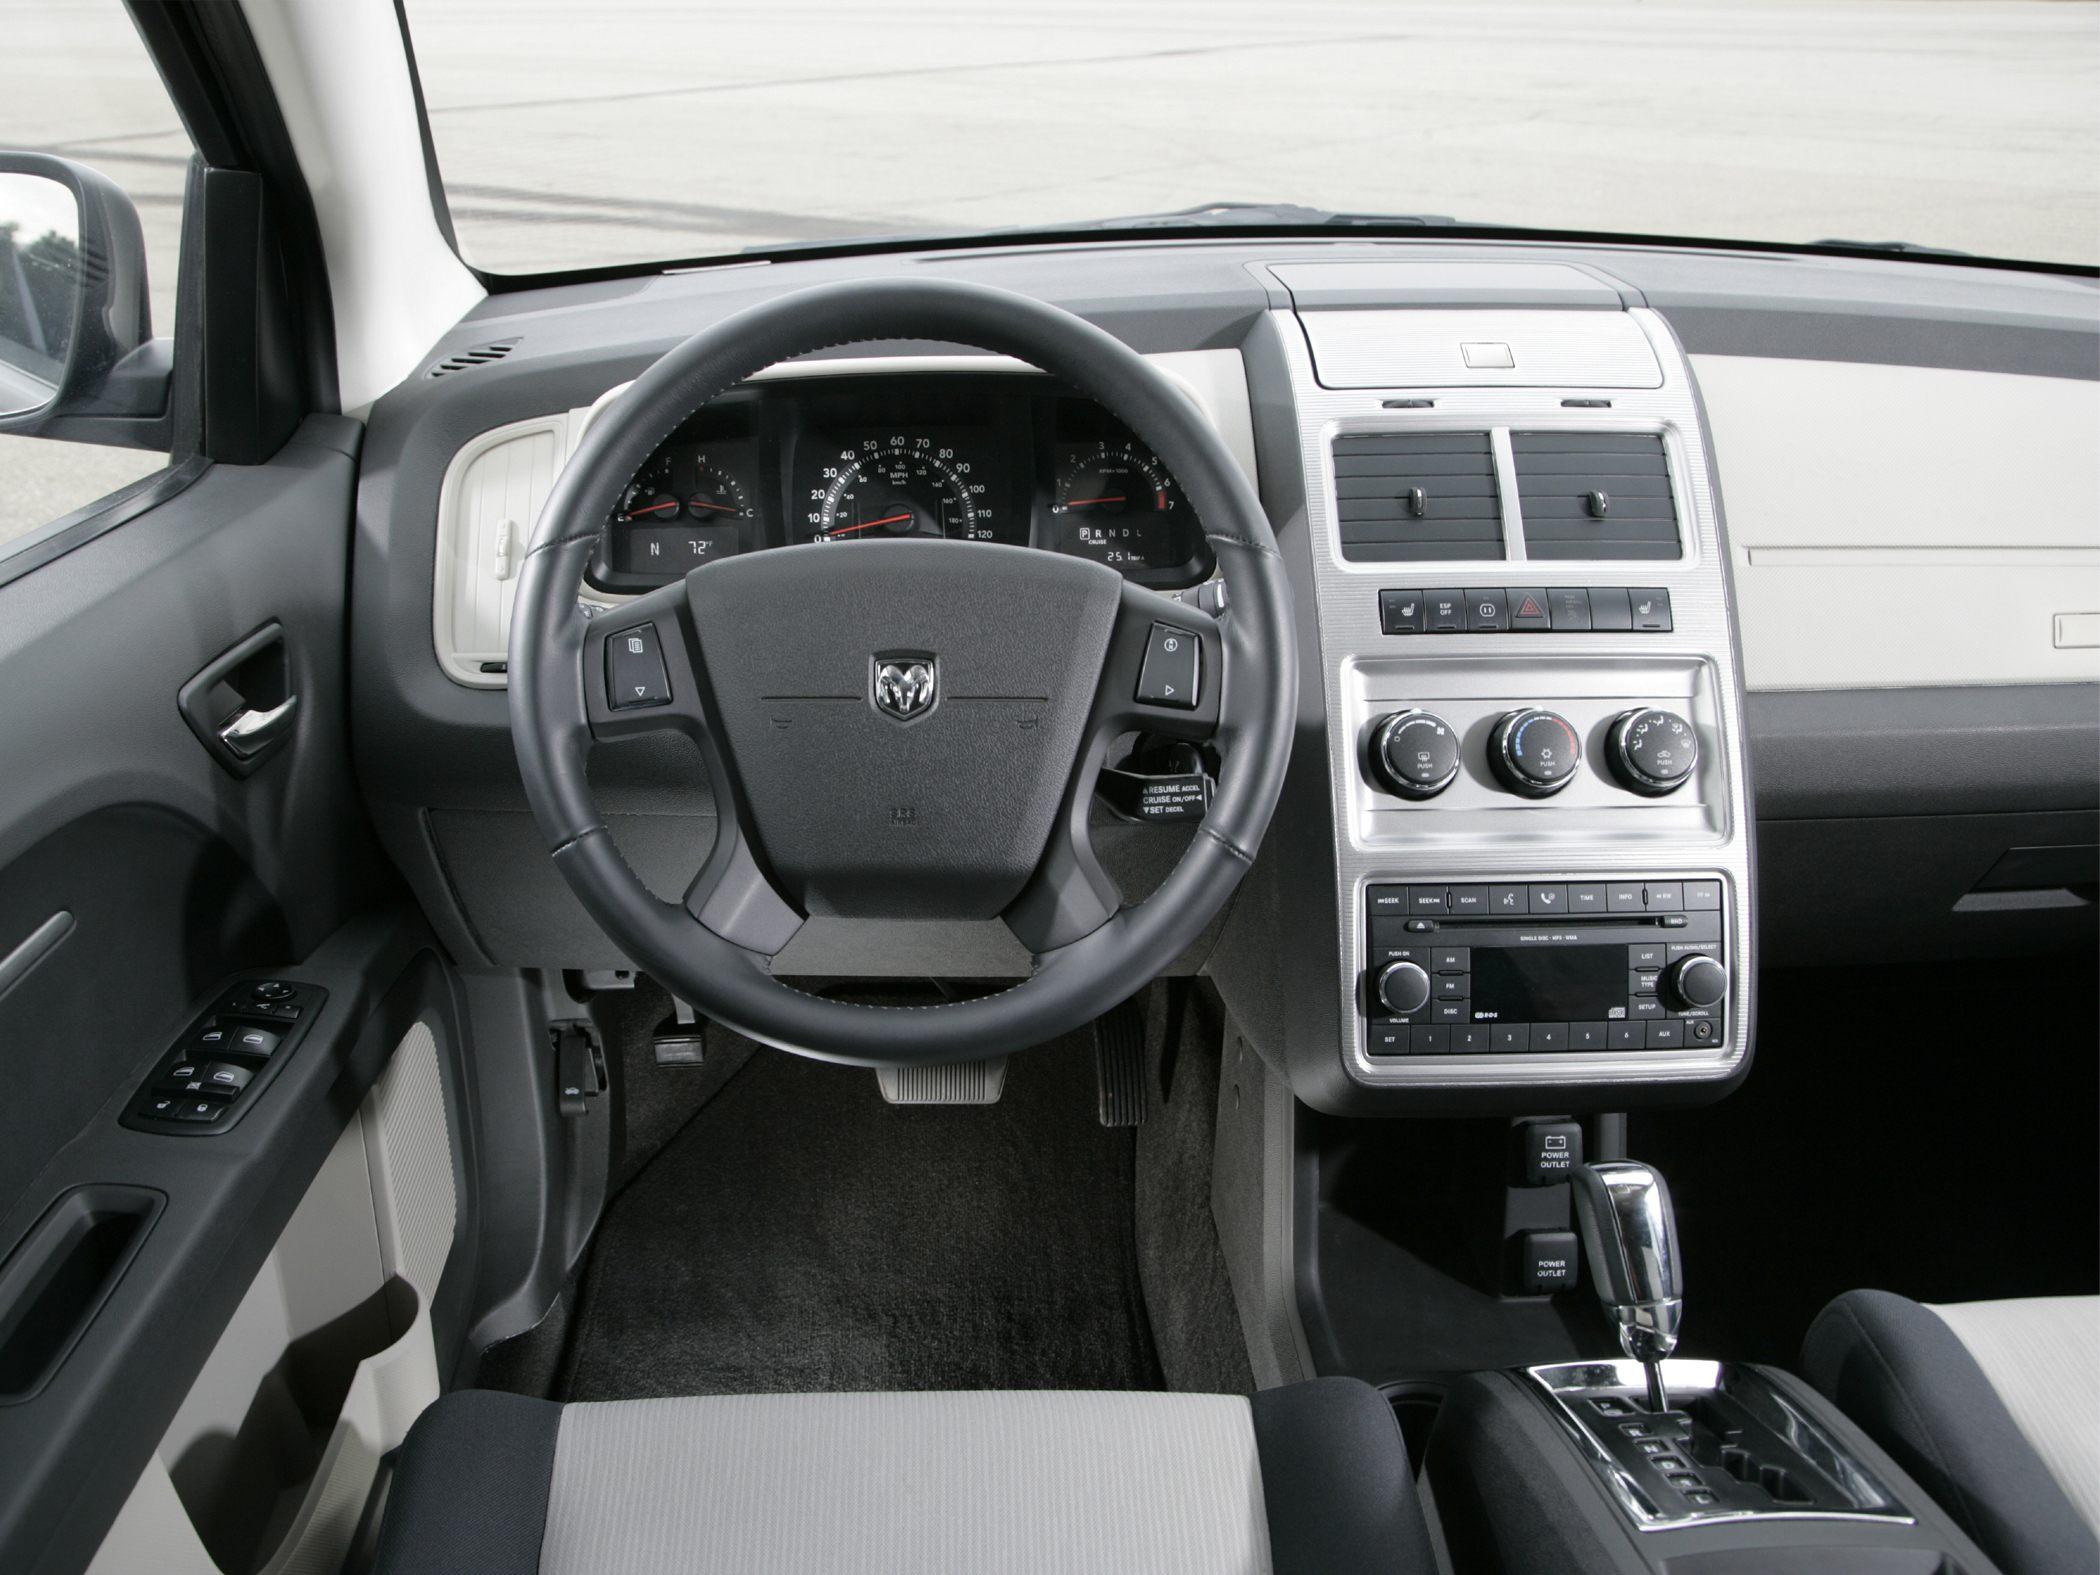 2010 Dodge Journey Image 11